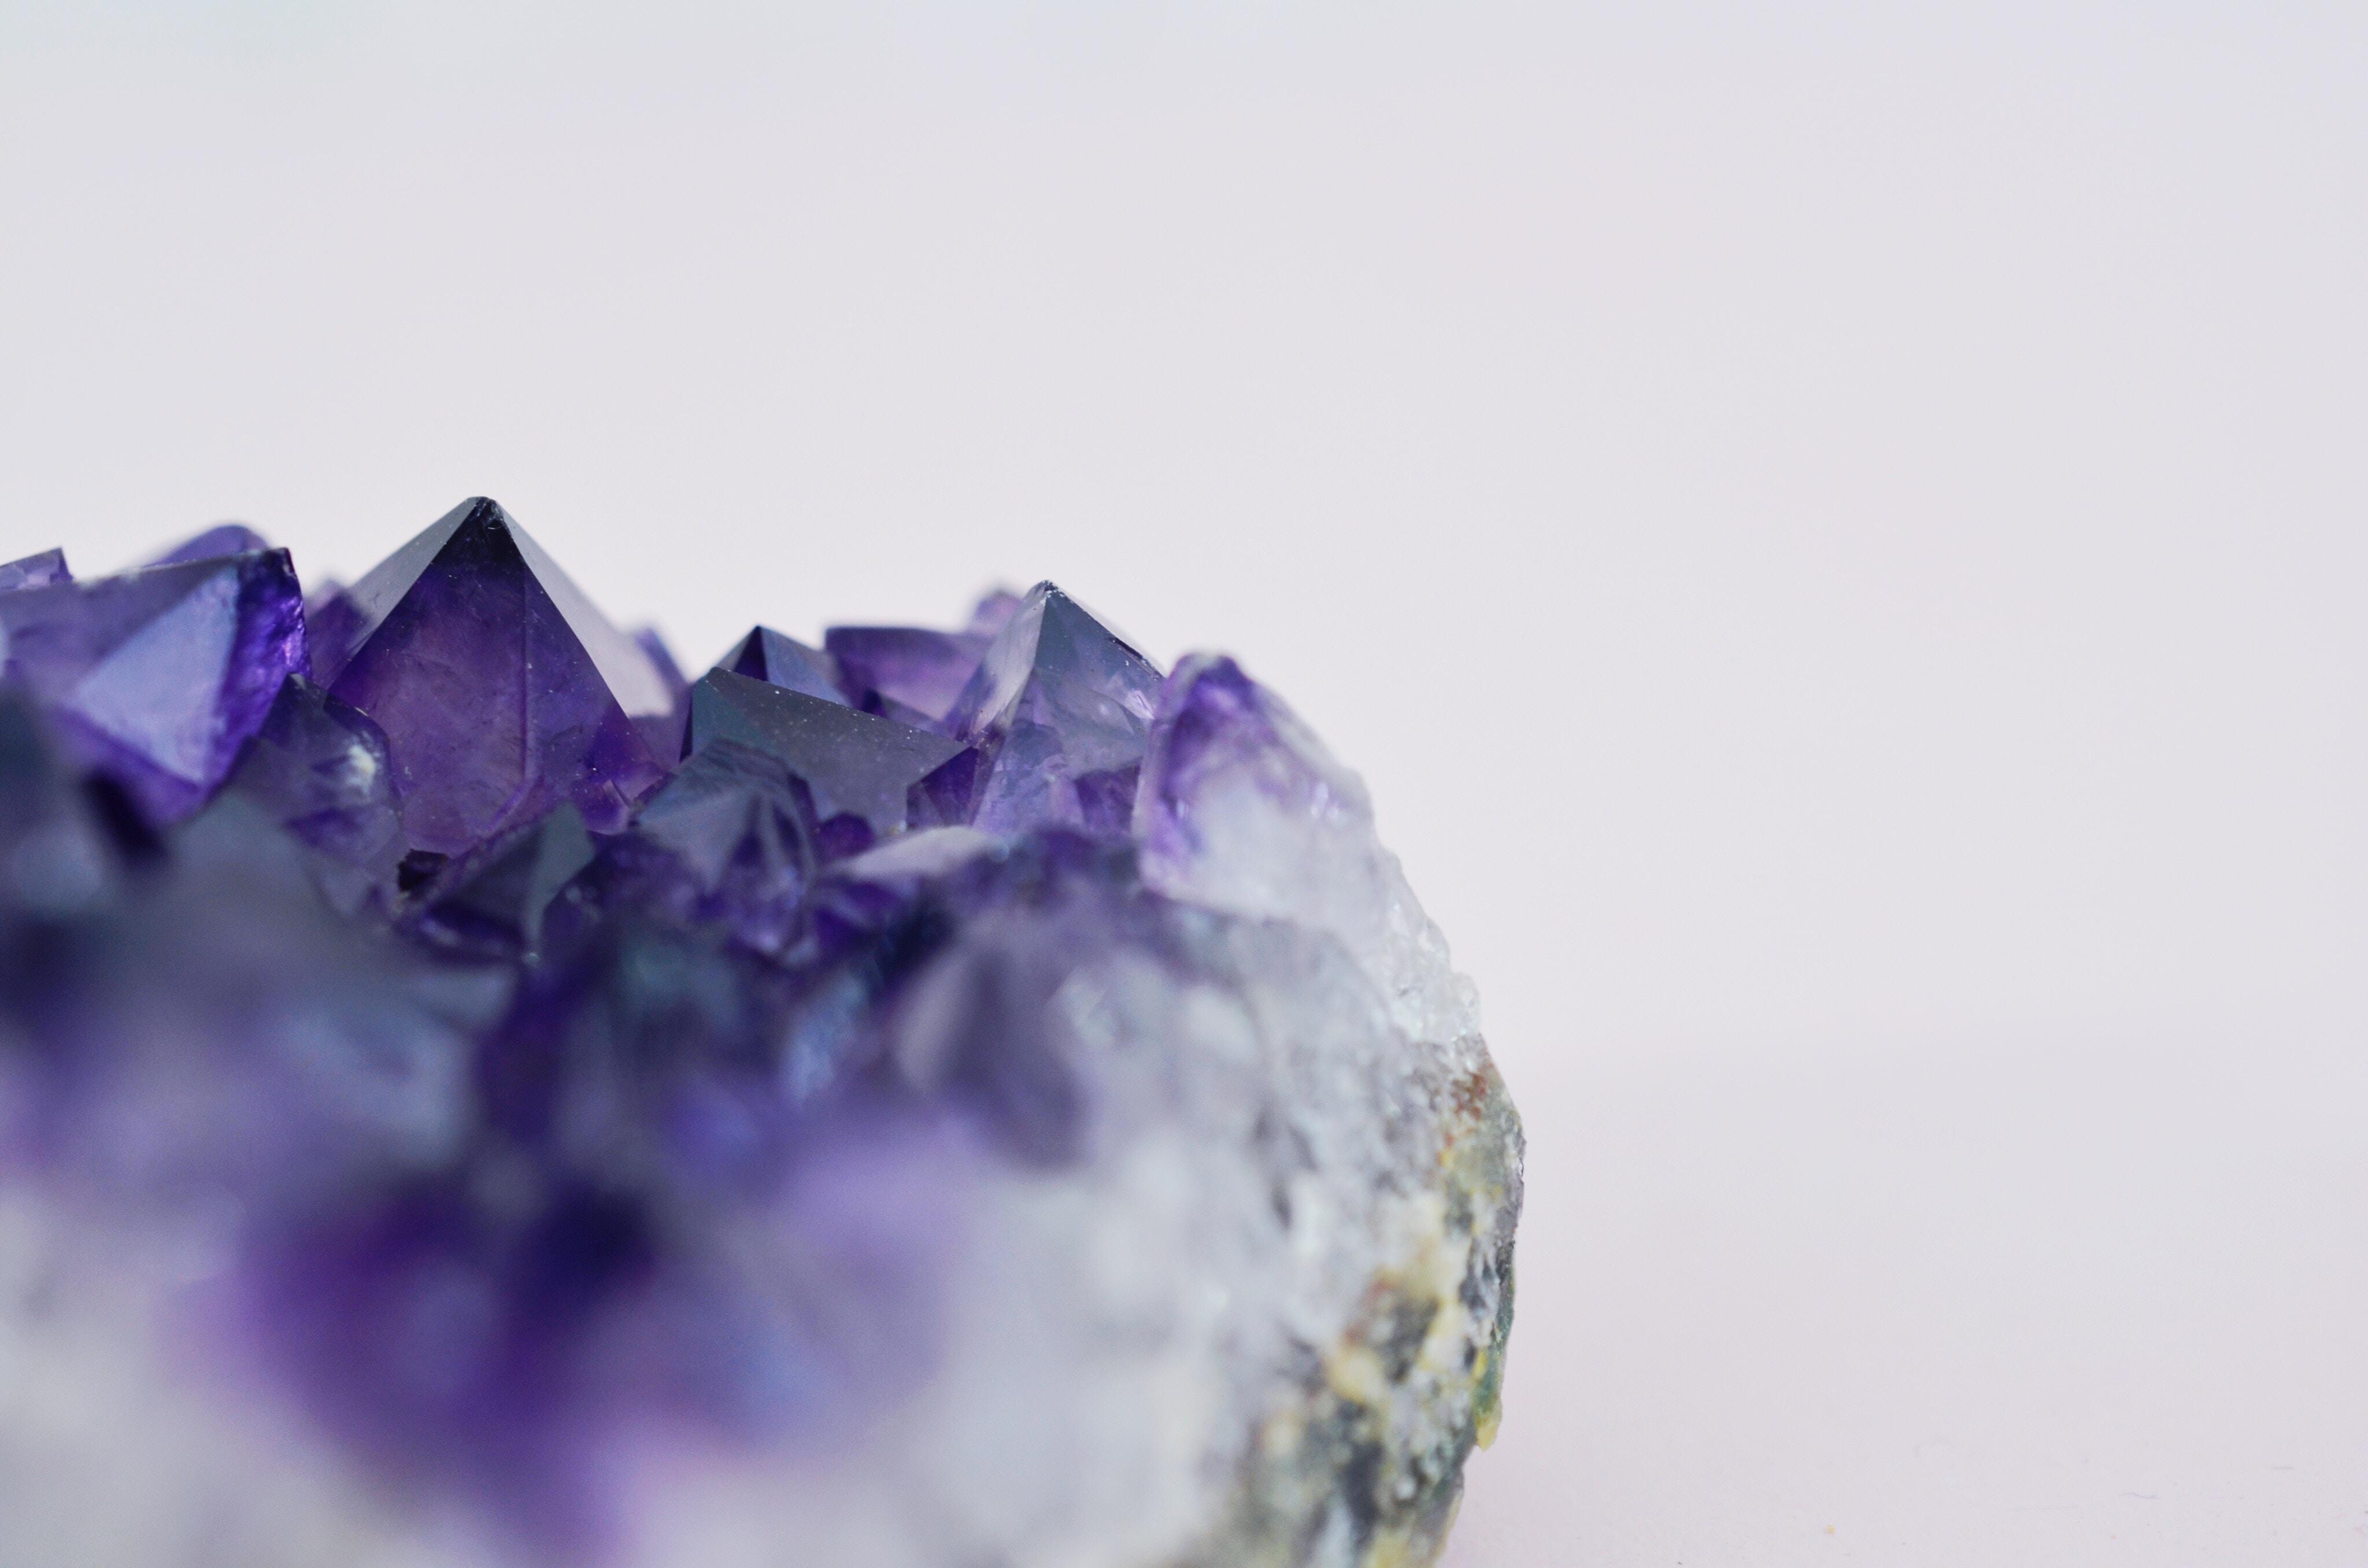 close-up photo of purple geode